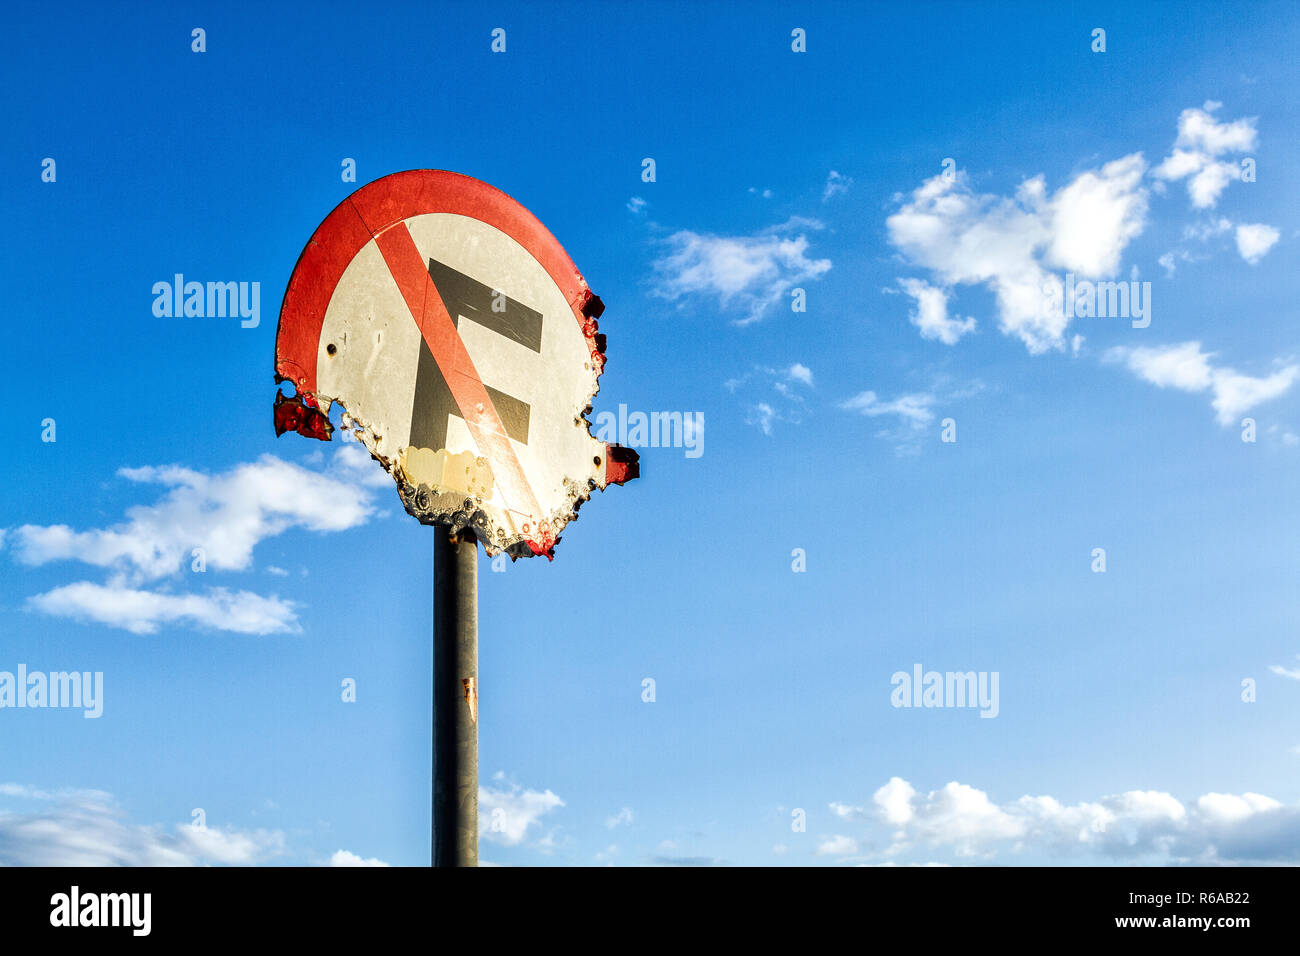 No parking sign corroded by sea air. Florianopolis, Santa Catarina, Brazil. - Stock Image